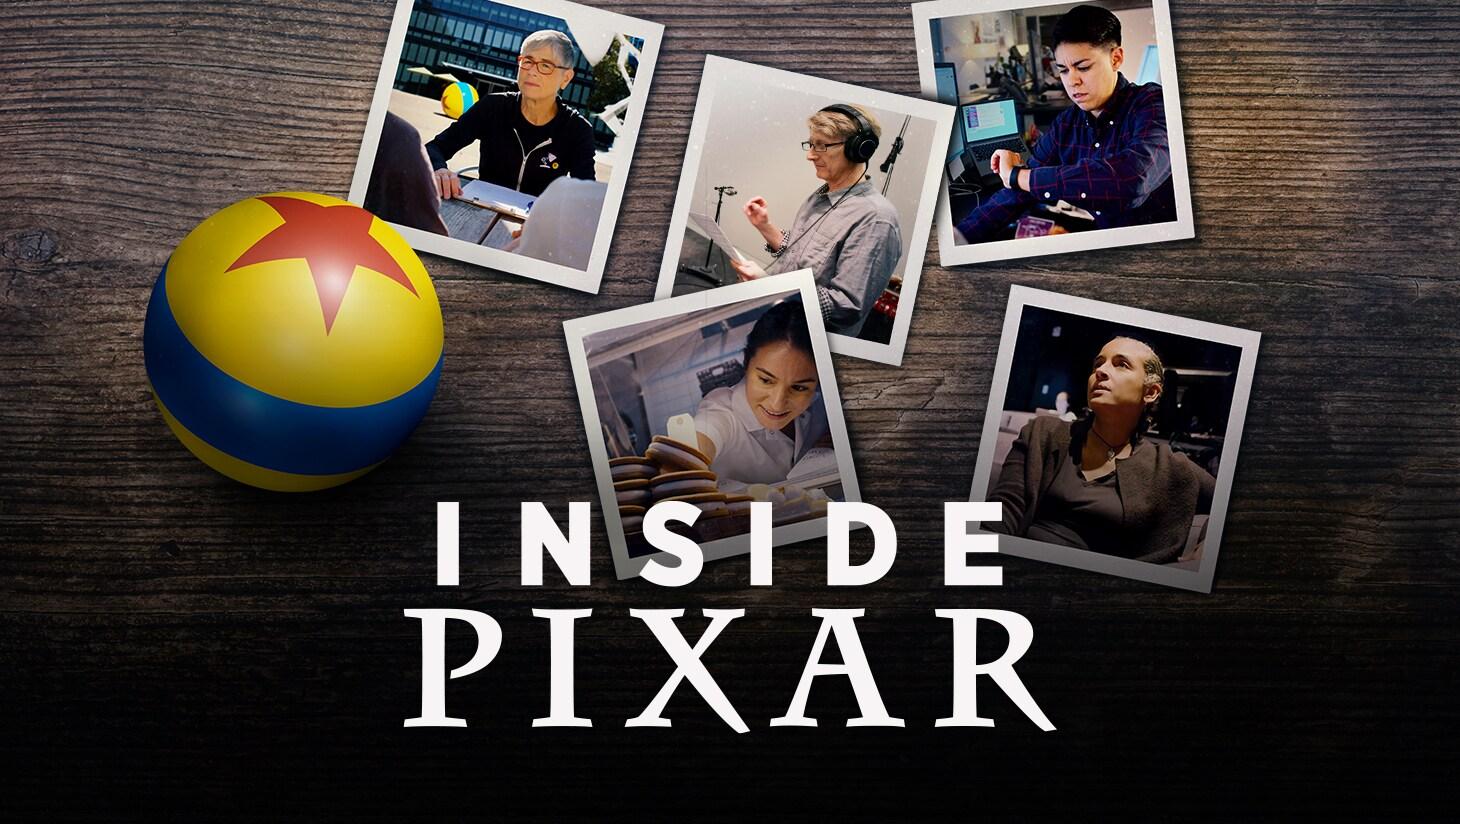 Inside Pixar logo